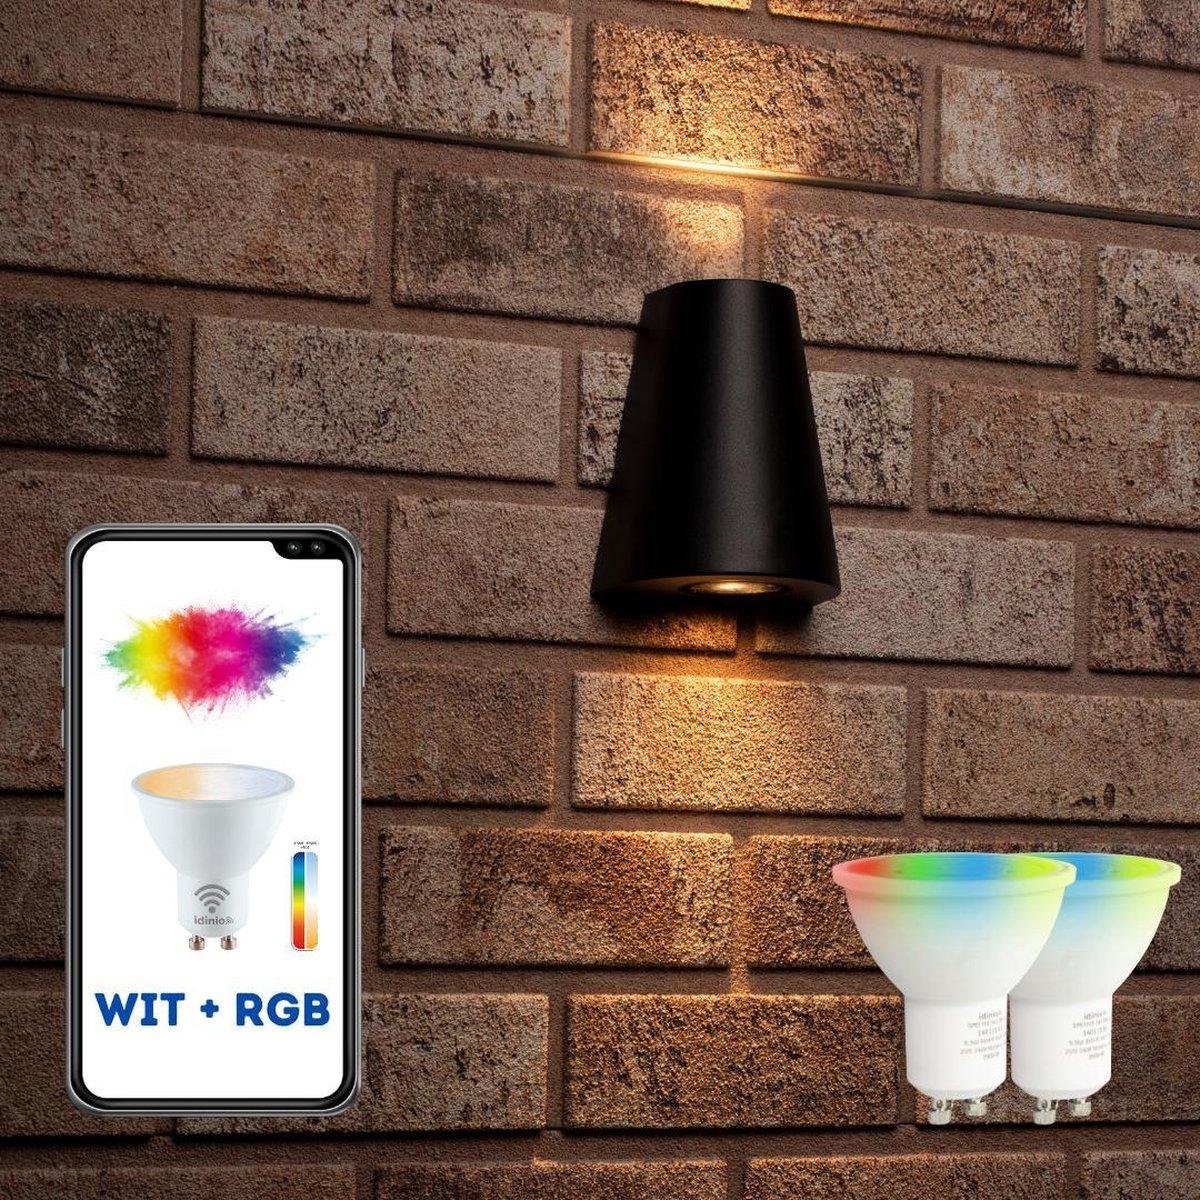 Proventa Slimme buitenlamp - Wandlamp Model G - White & Color - 1 x LED Muurlamp